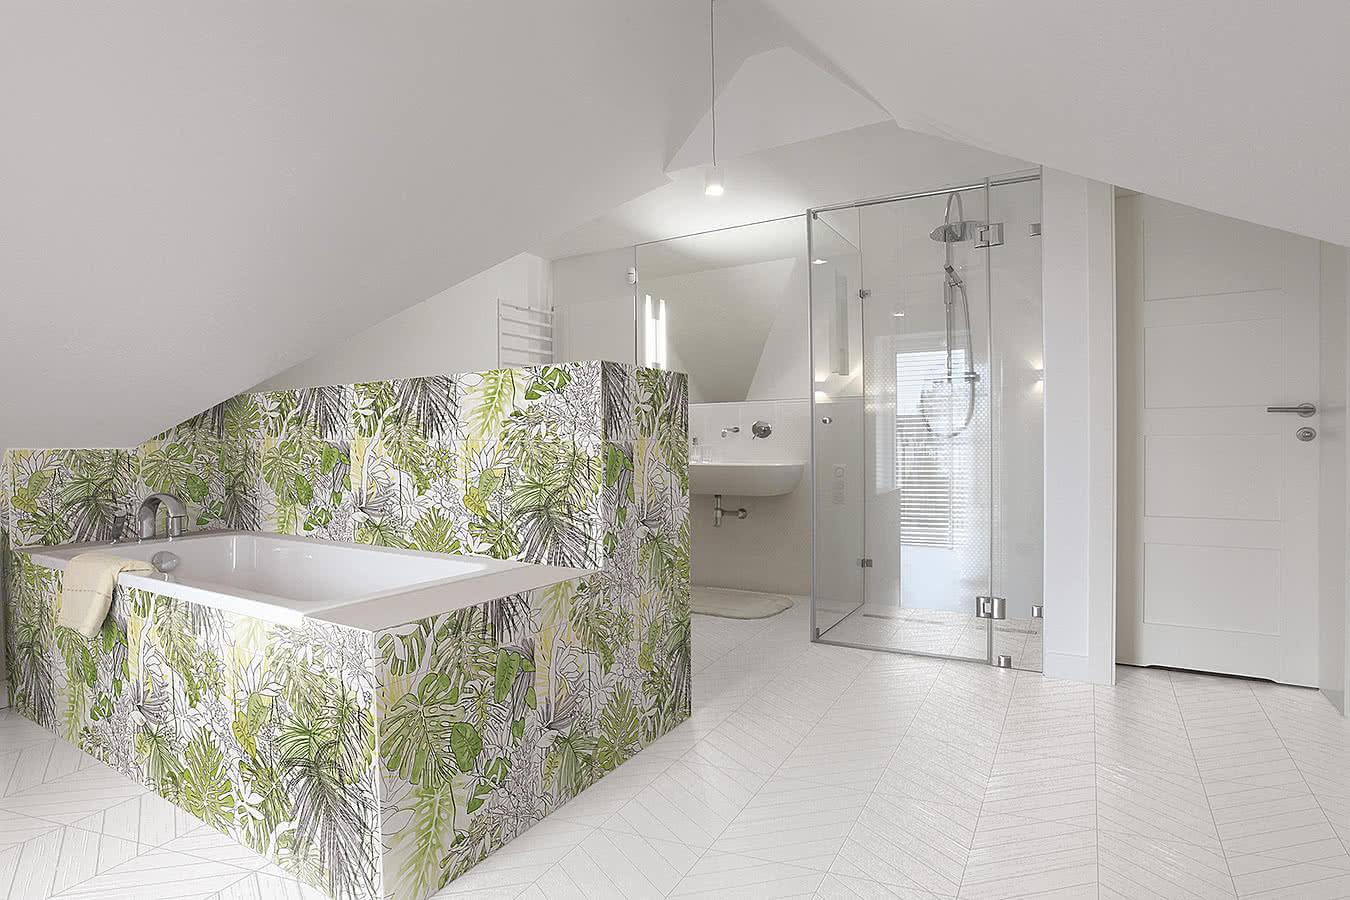 Płytka Ornamenta Jungle dostępna w Internity Home i Prodesigne